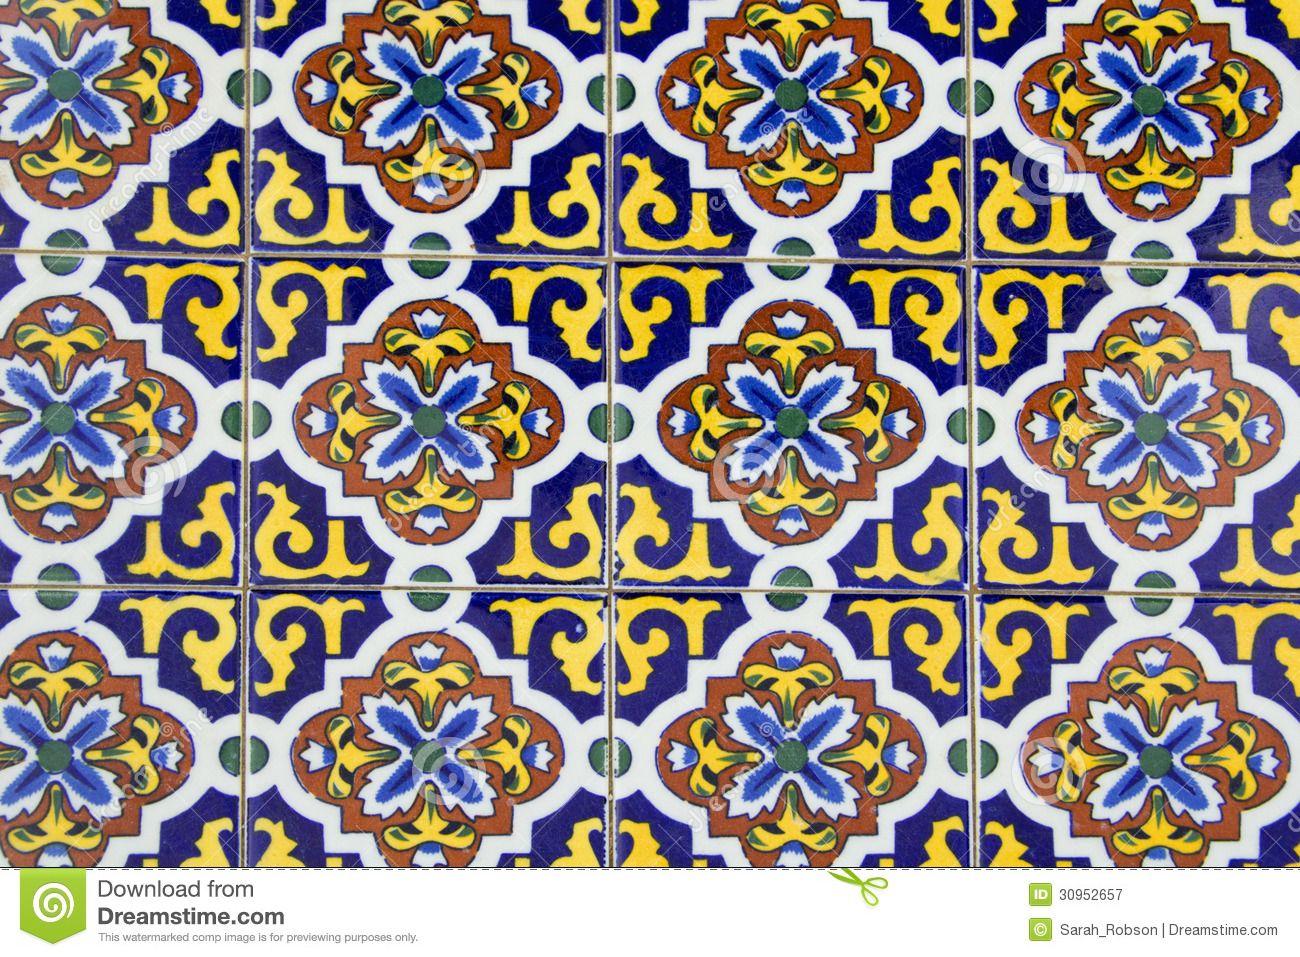 Azulejos sevillanos para patios buscar con google for Azulejos para patios